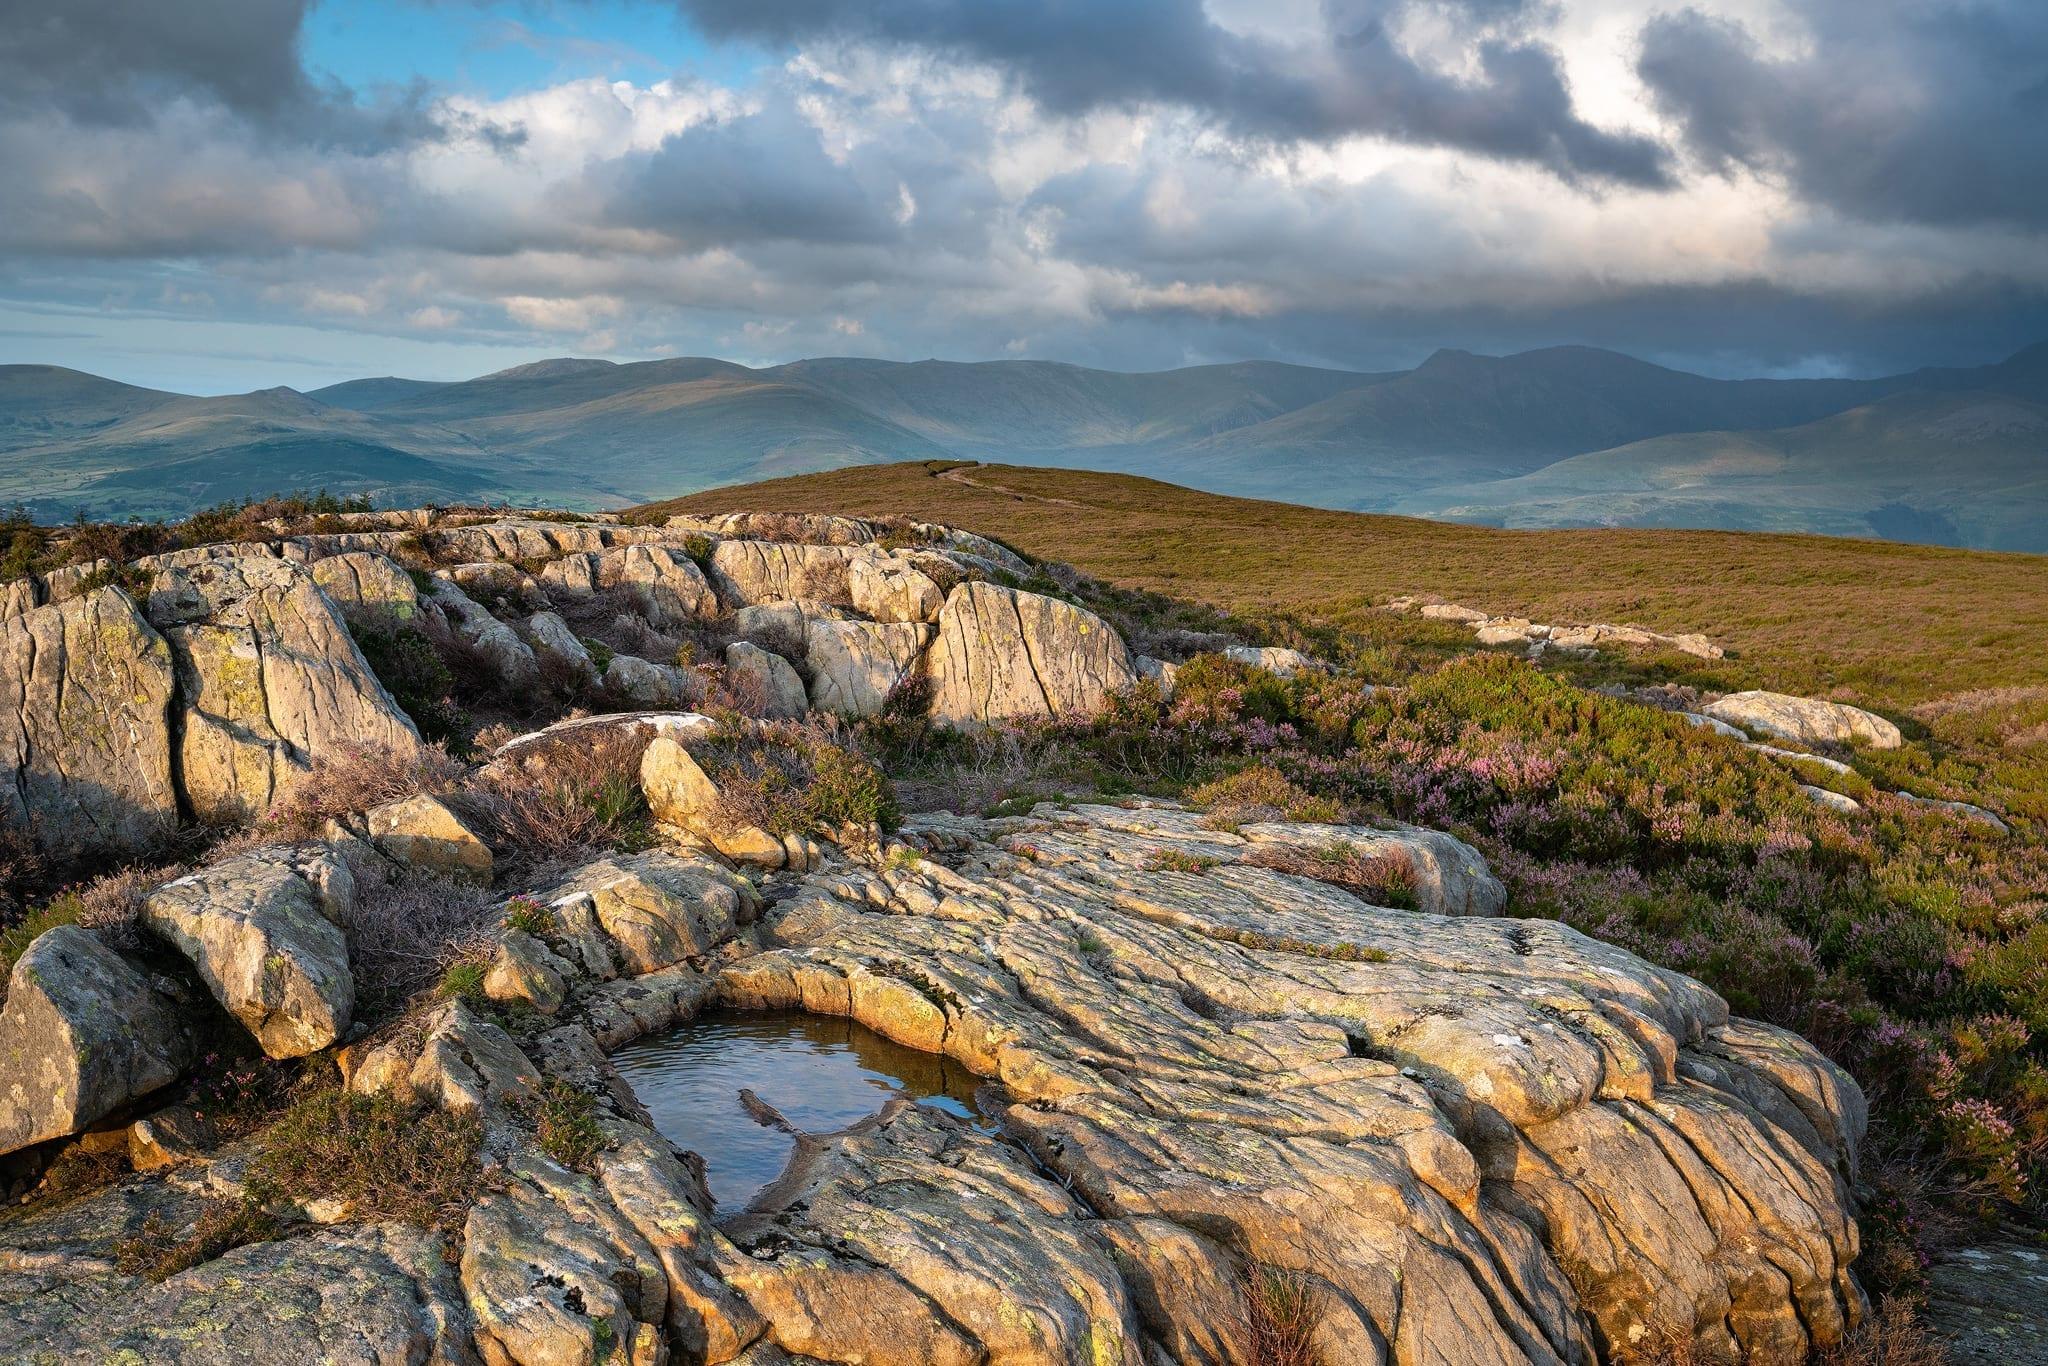 Moleyci – Snowdonia Landscape Photography